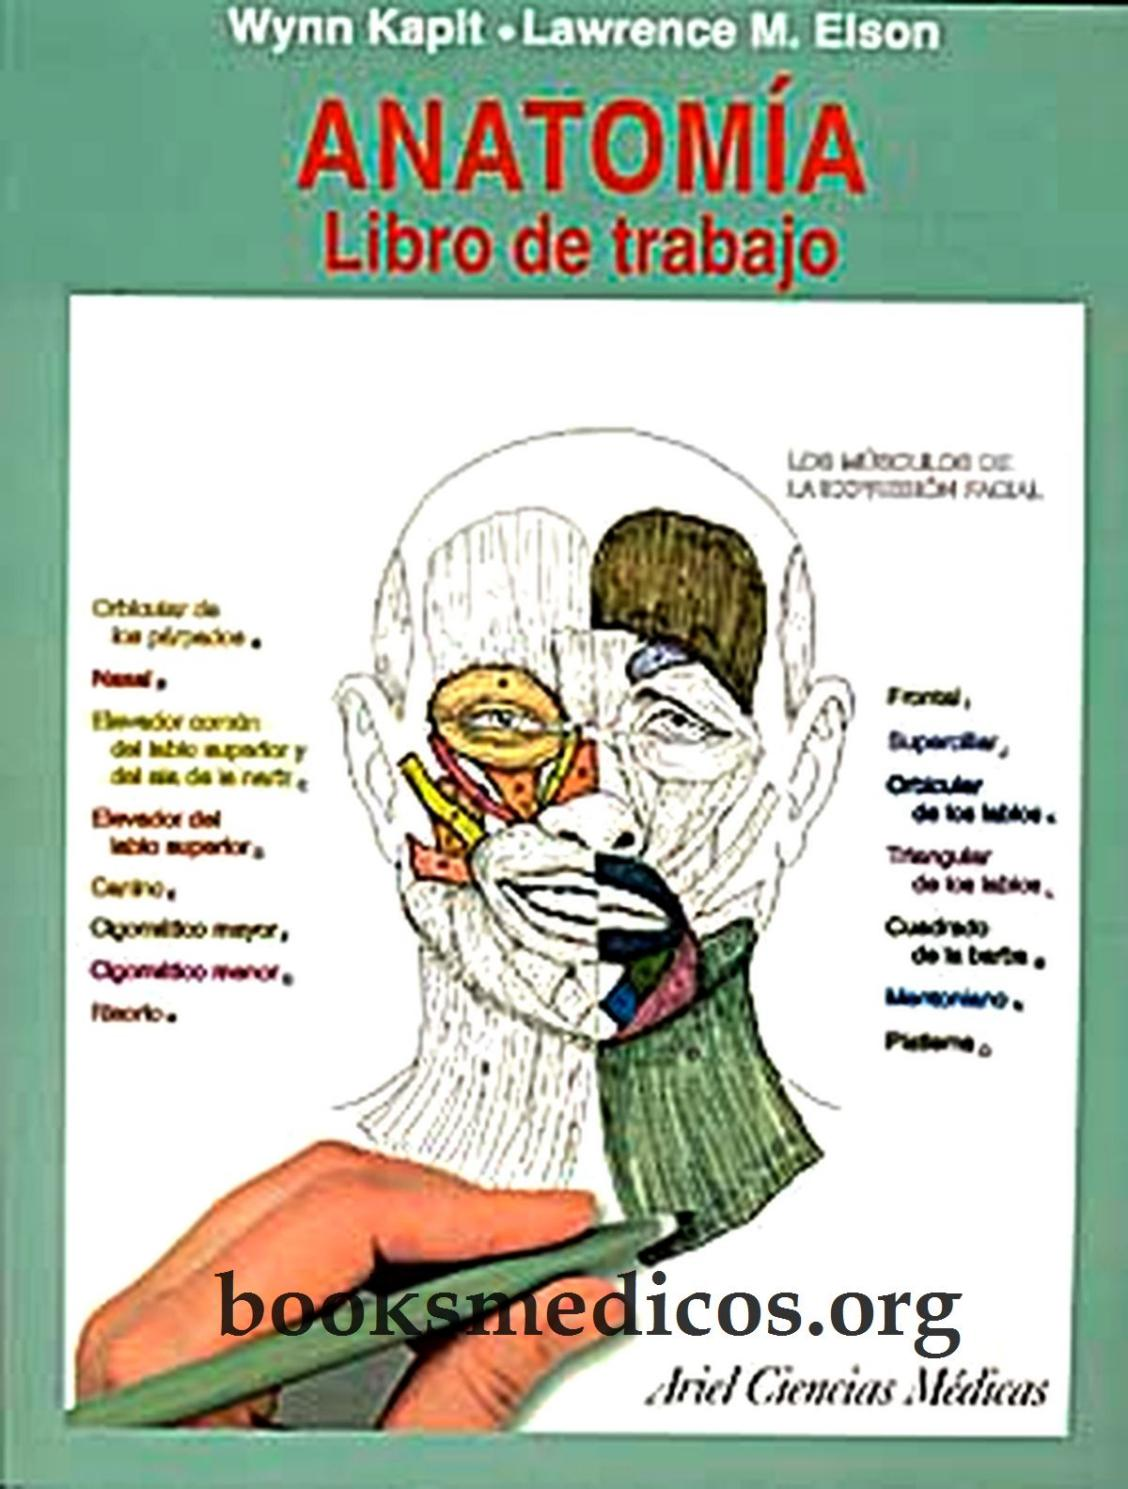 Anatomia libro de trabajo booksmedicos org by jhadyra - issuu